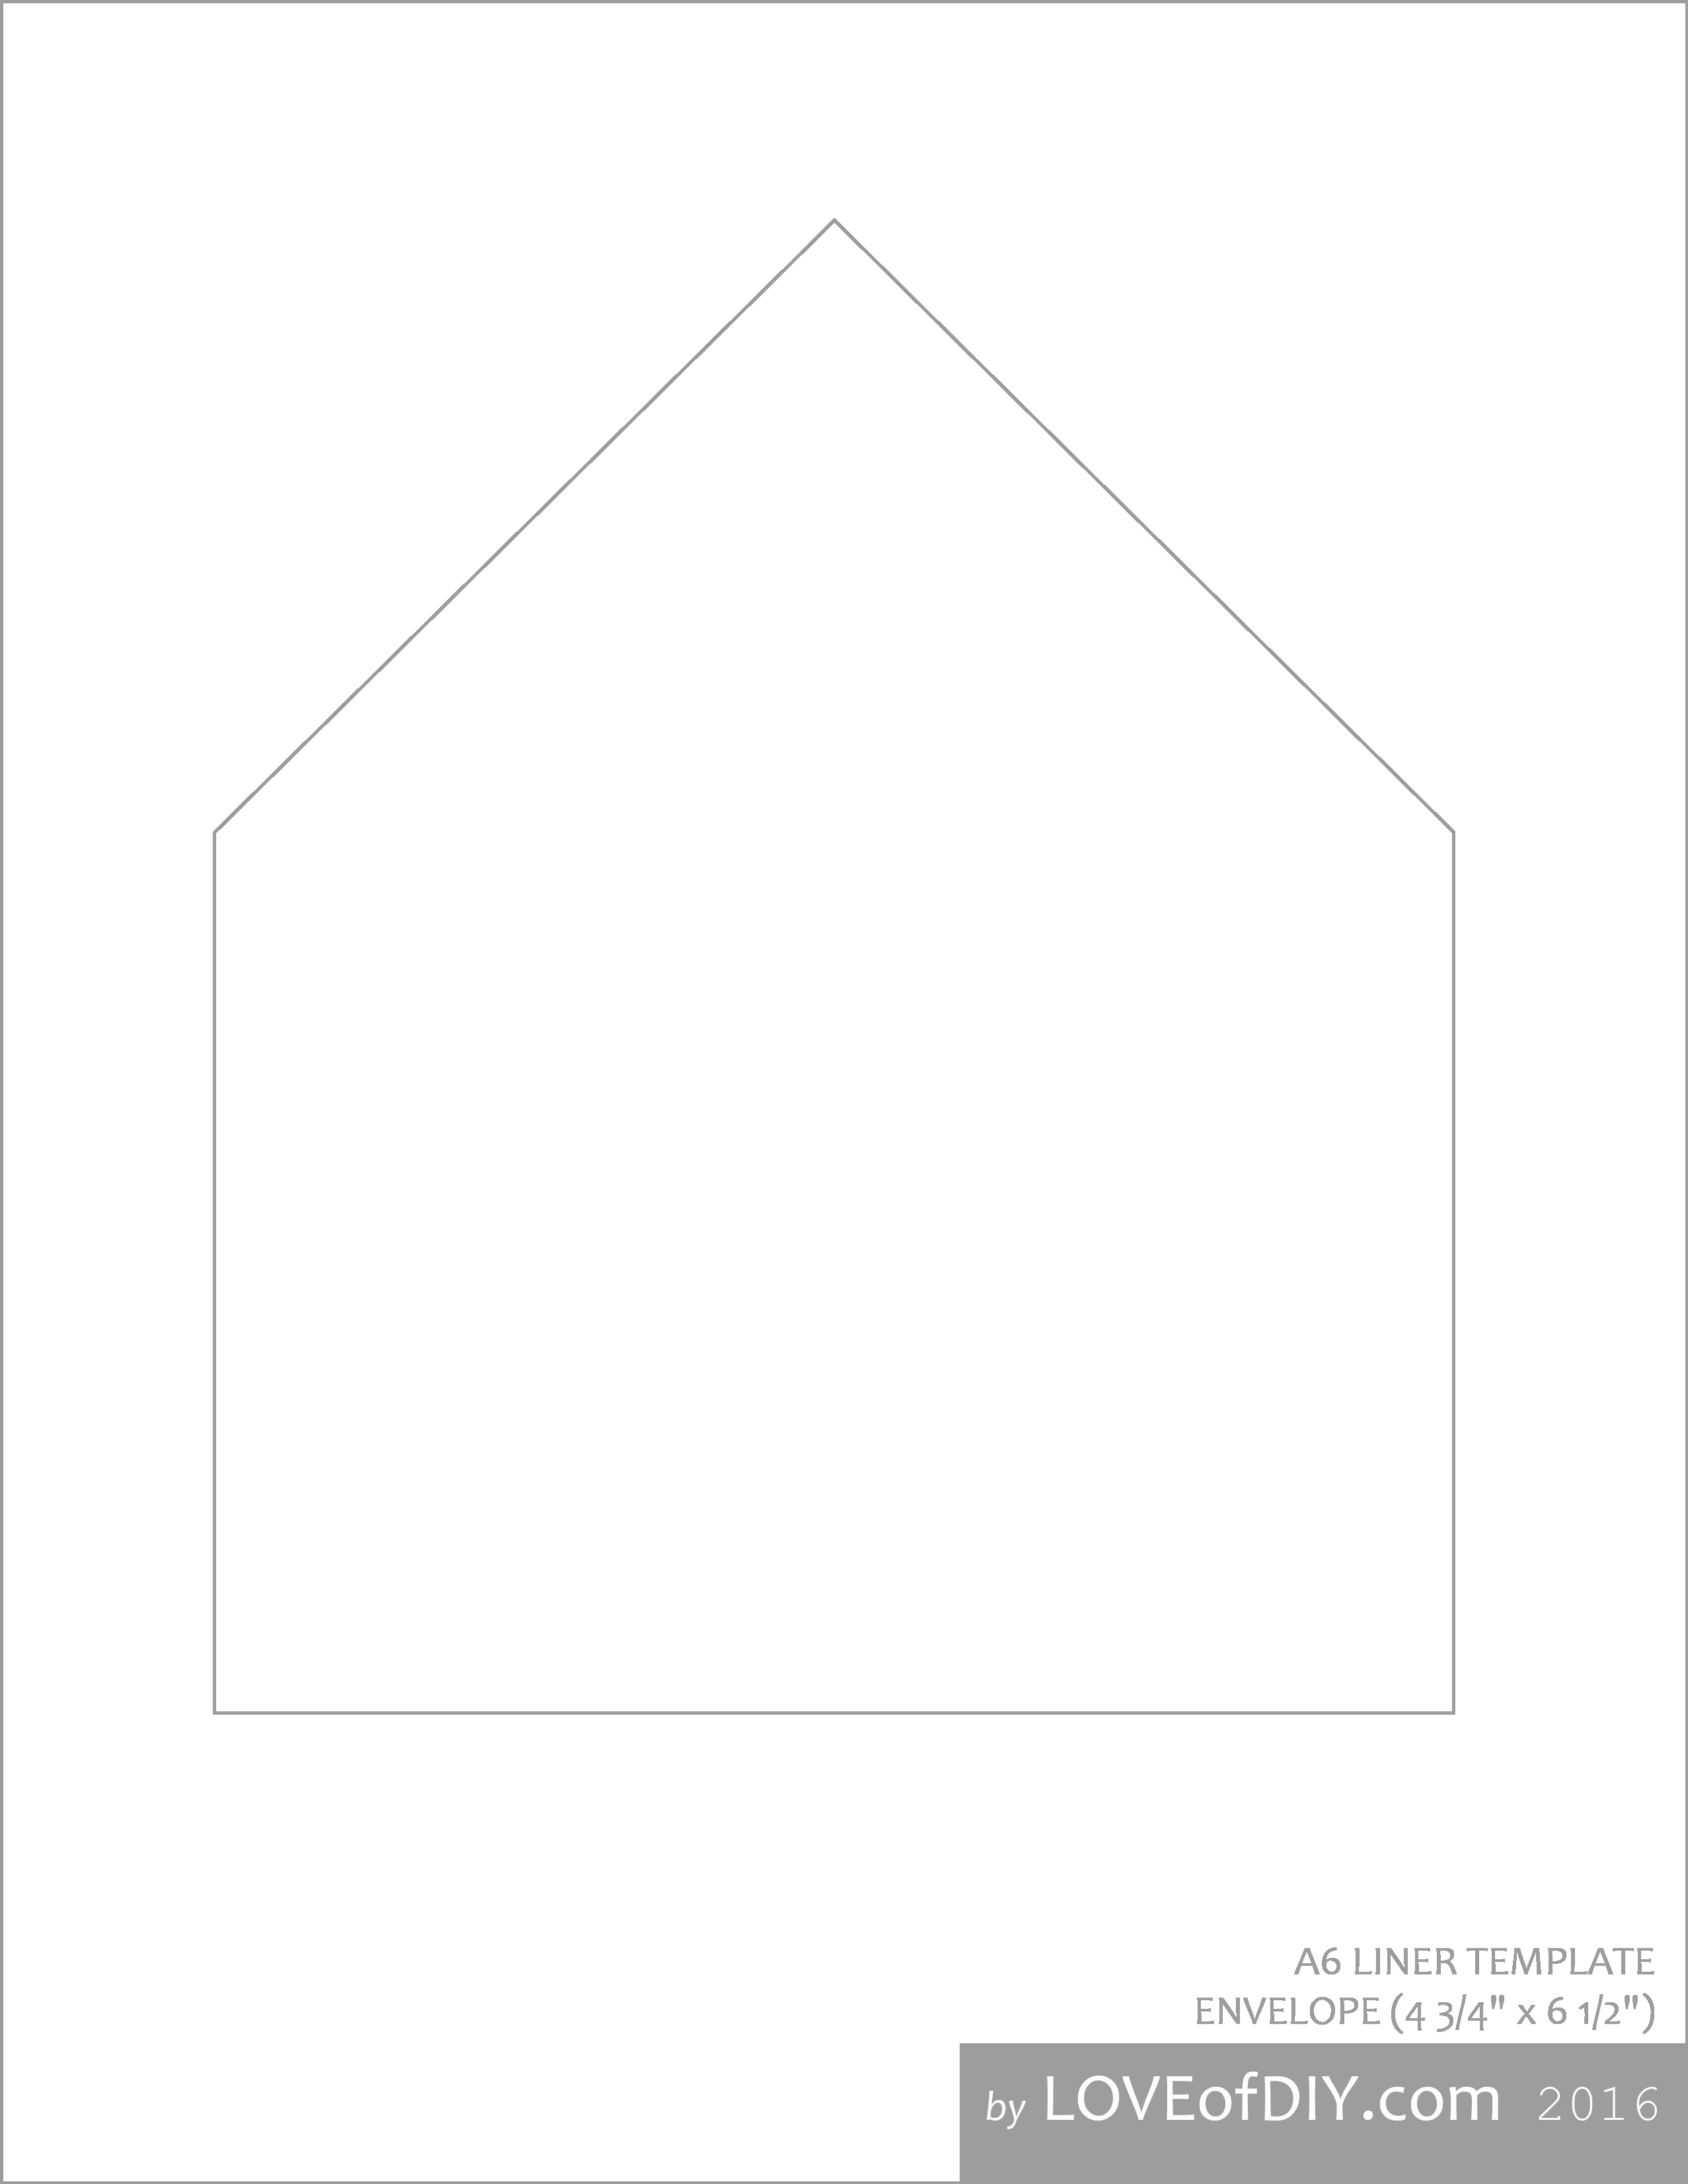 A2 Envelope Template Word Fresh Envelope Liner Tutorial